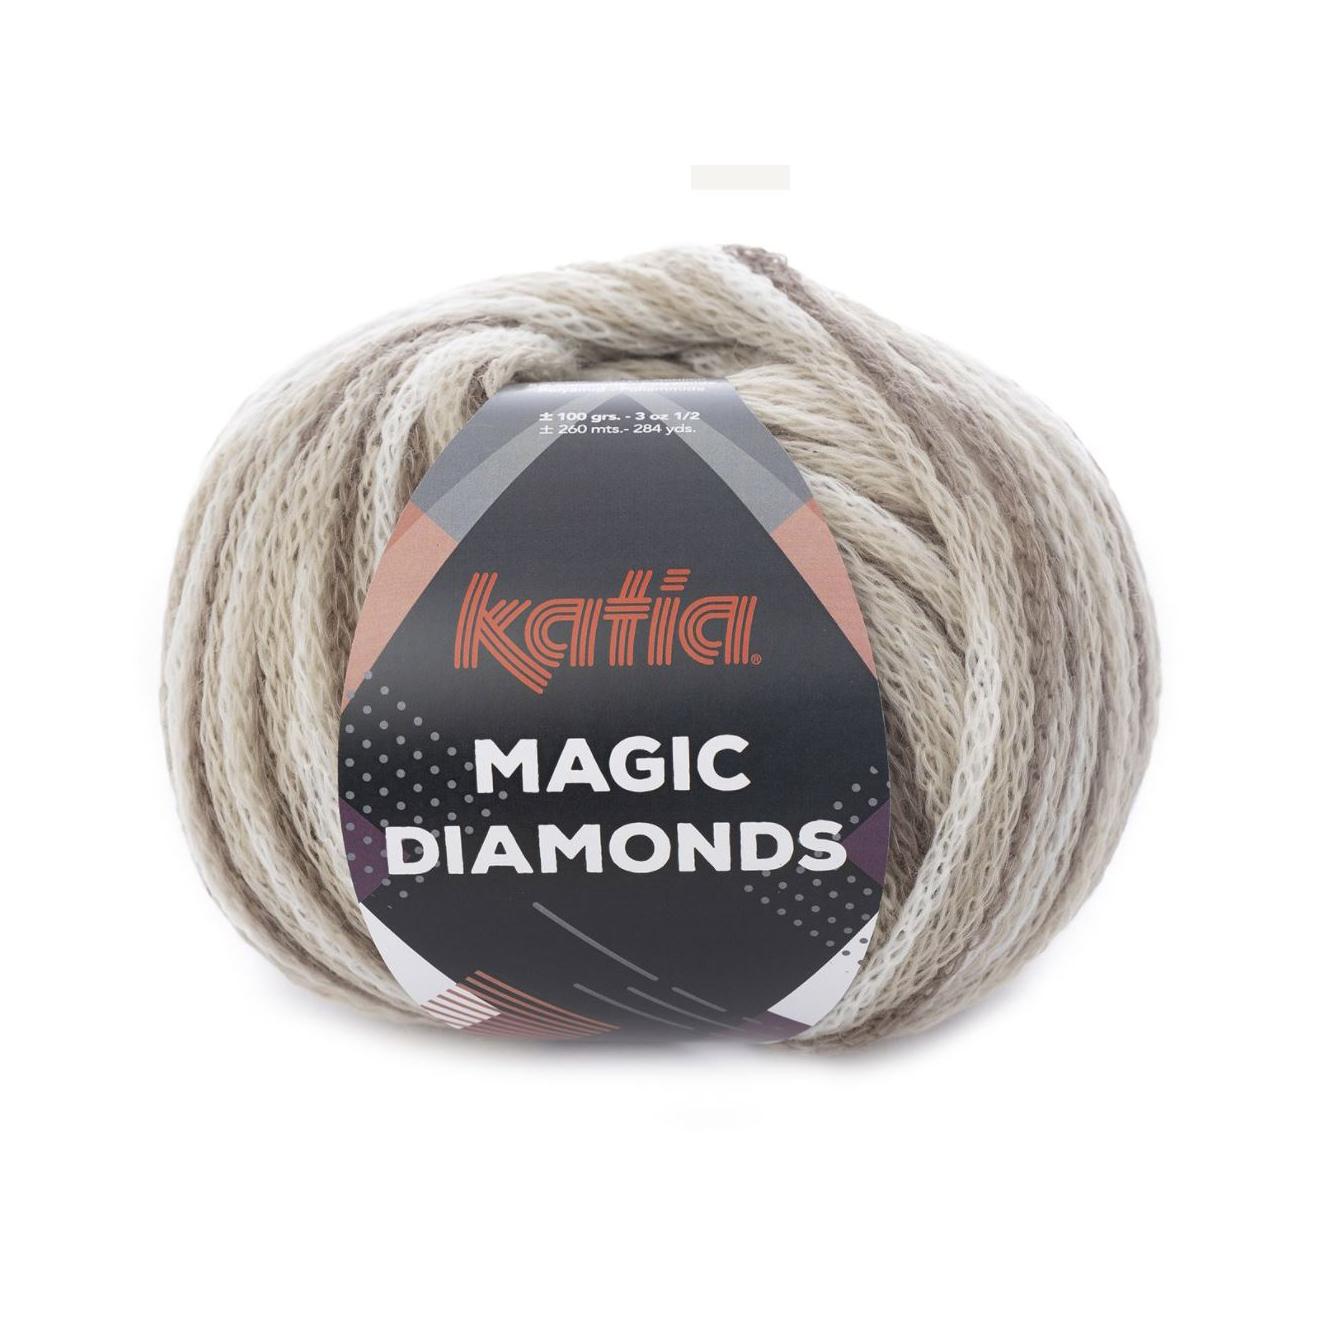 Magic Diamonds 50 brun/beige/creme